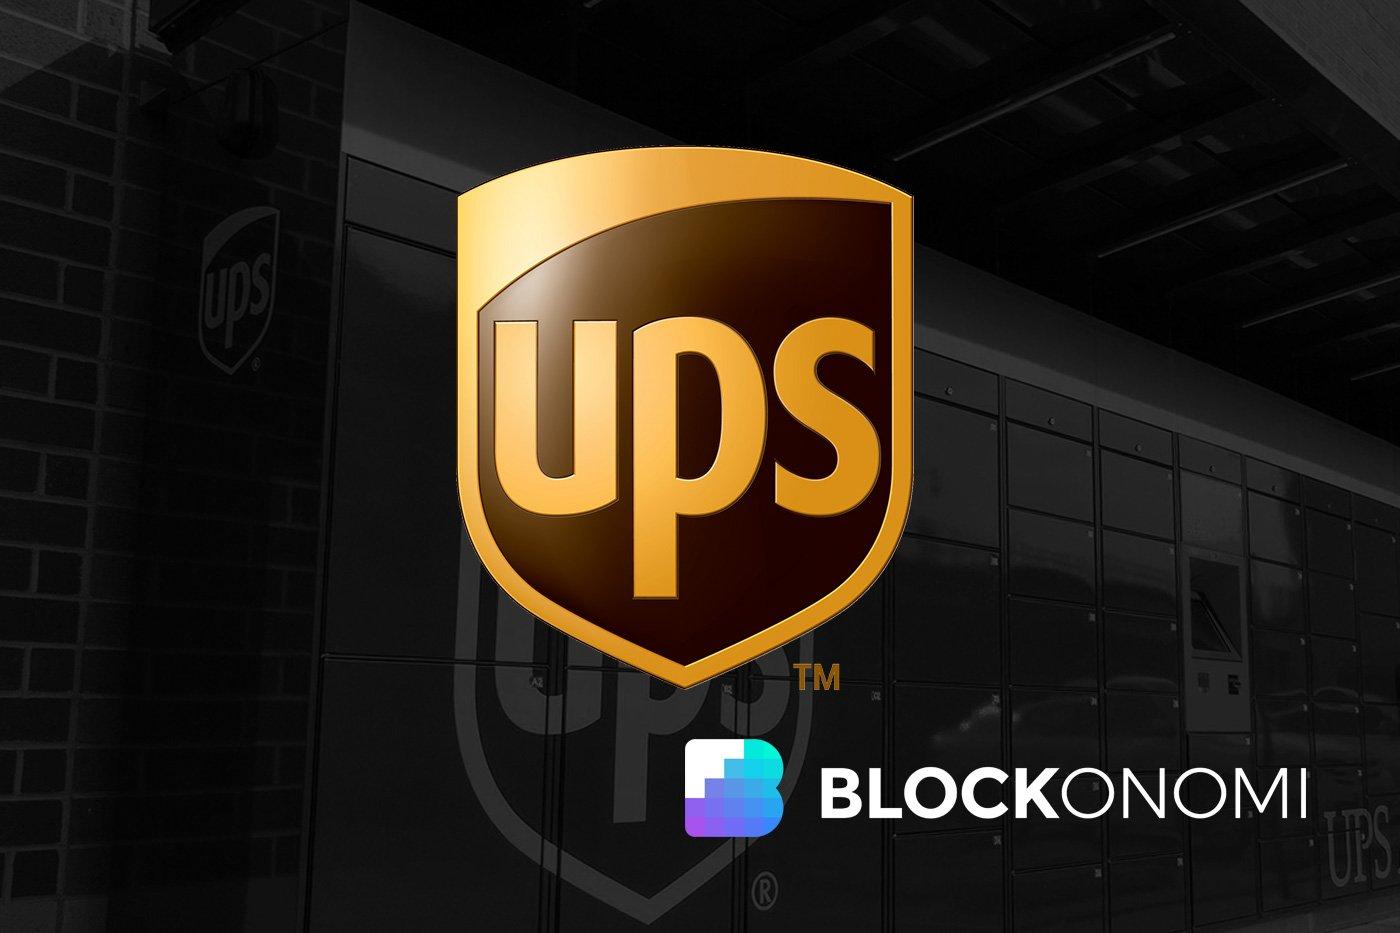 UPS Blockchain Patent